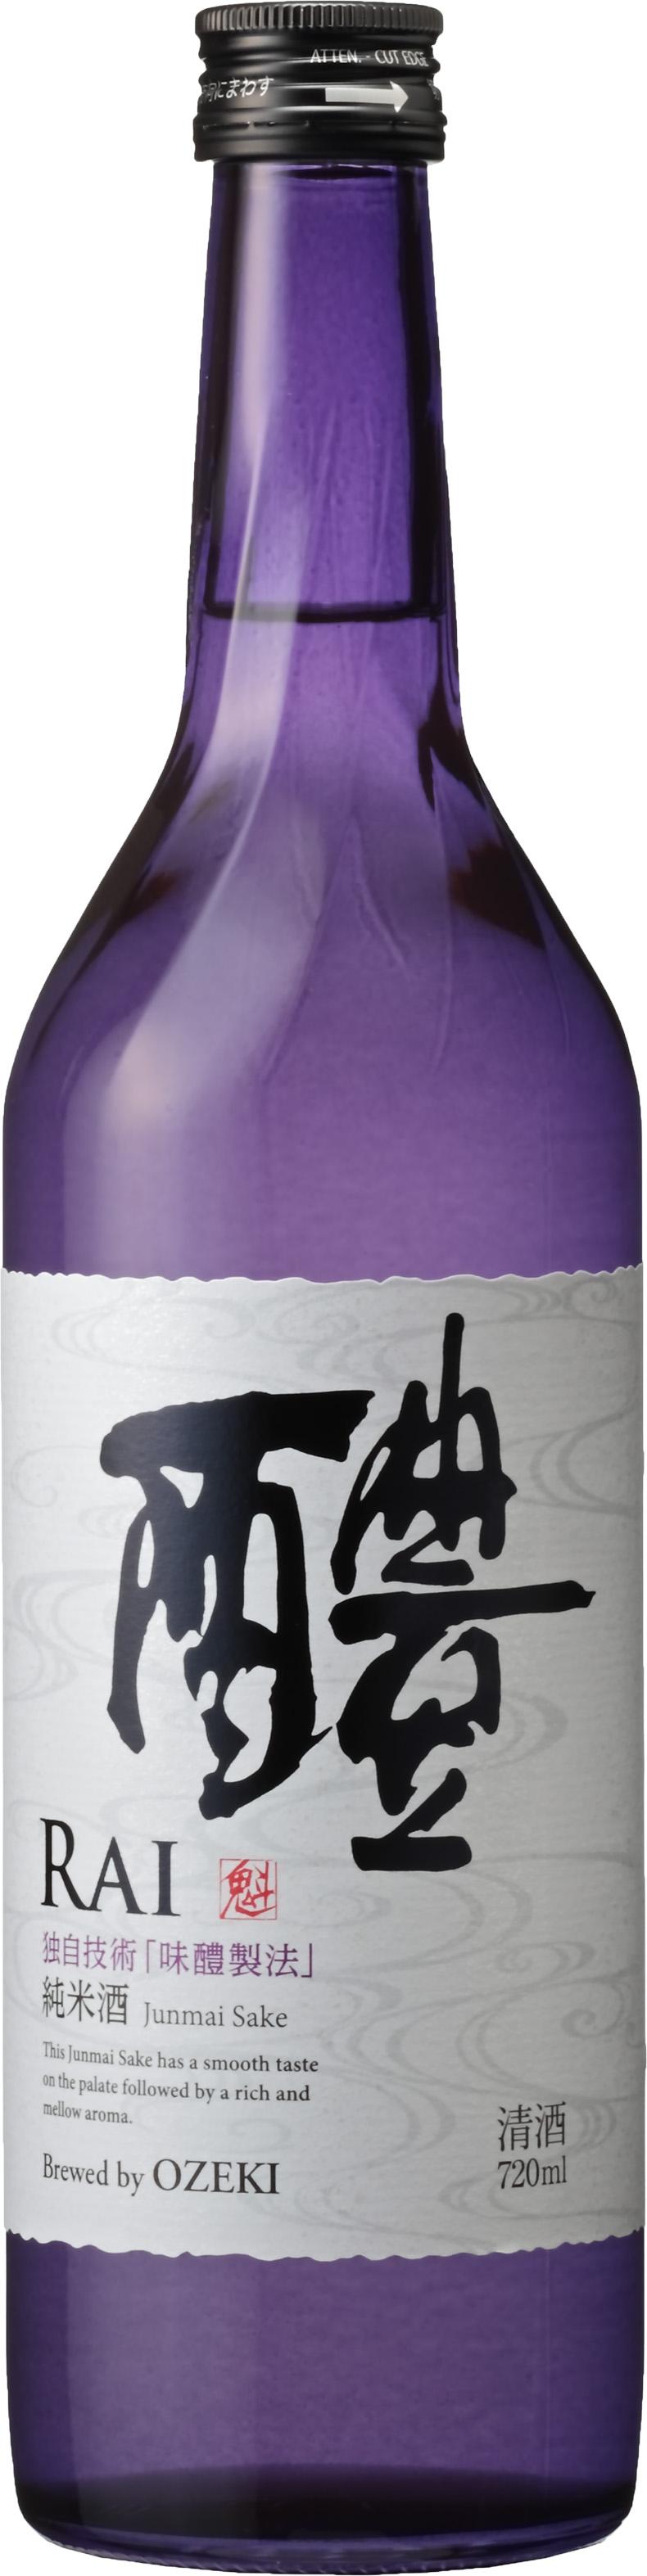 Ozeki Rai Junmai Sake